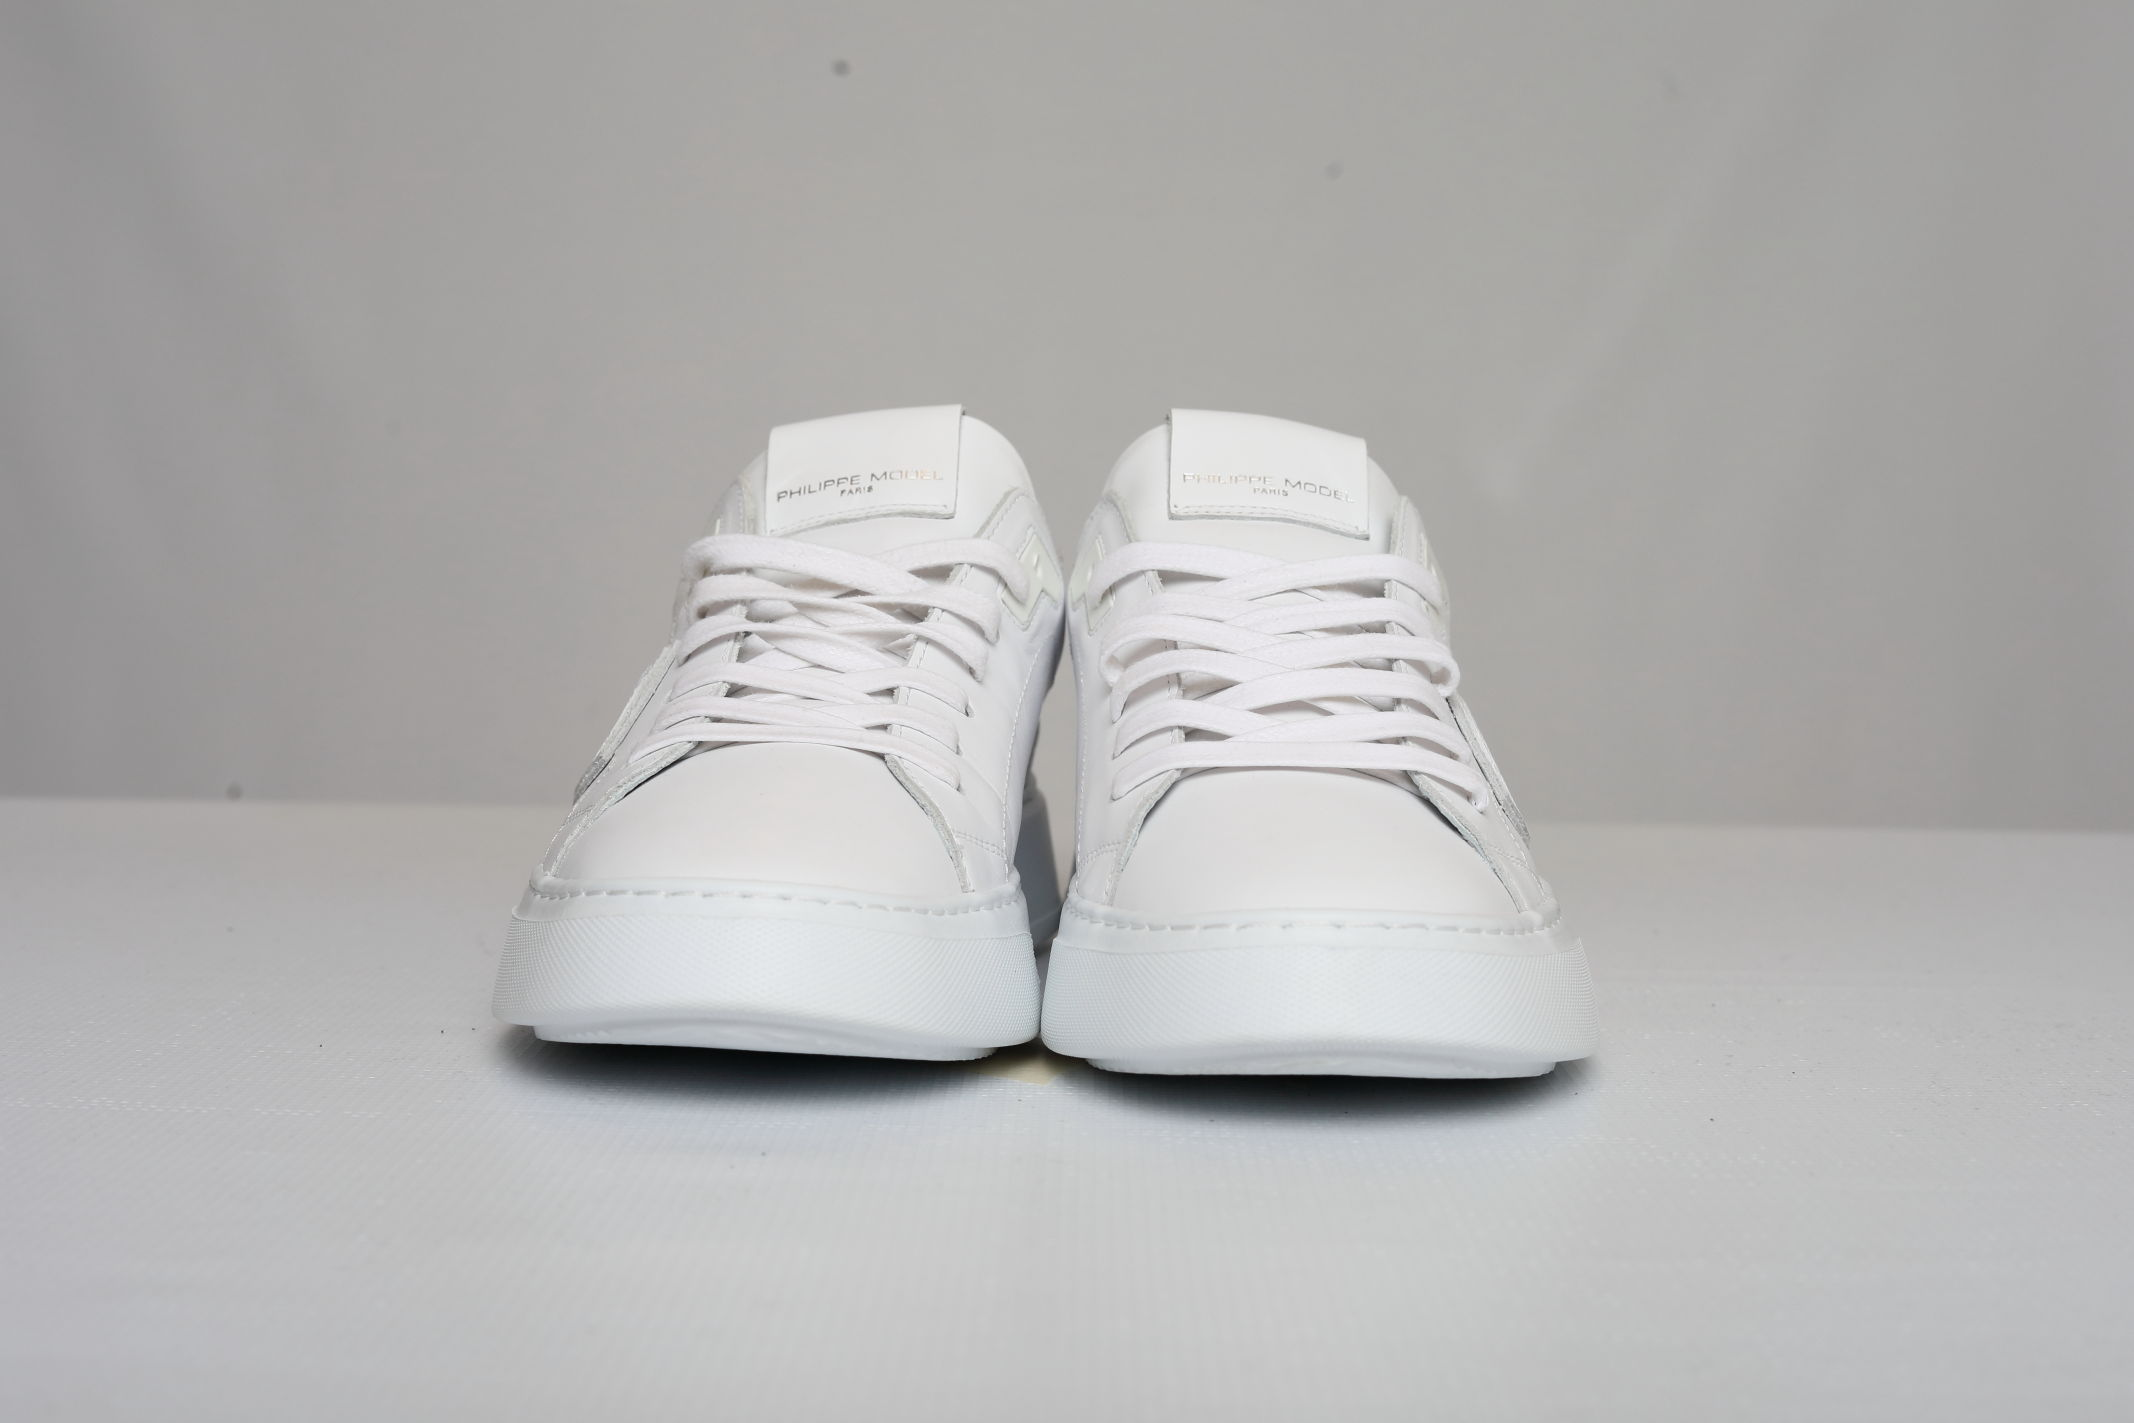 TEMPLE LOW MAN PHILIPPE MODEL   Shoes   BTLUV007